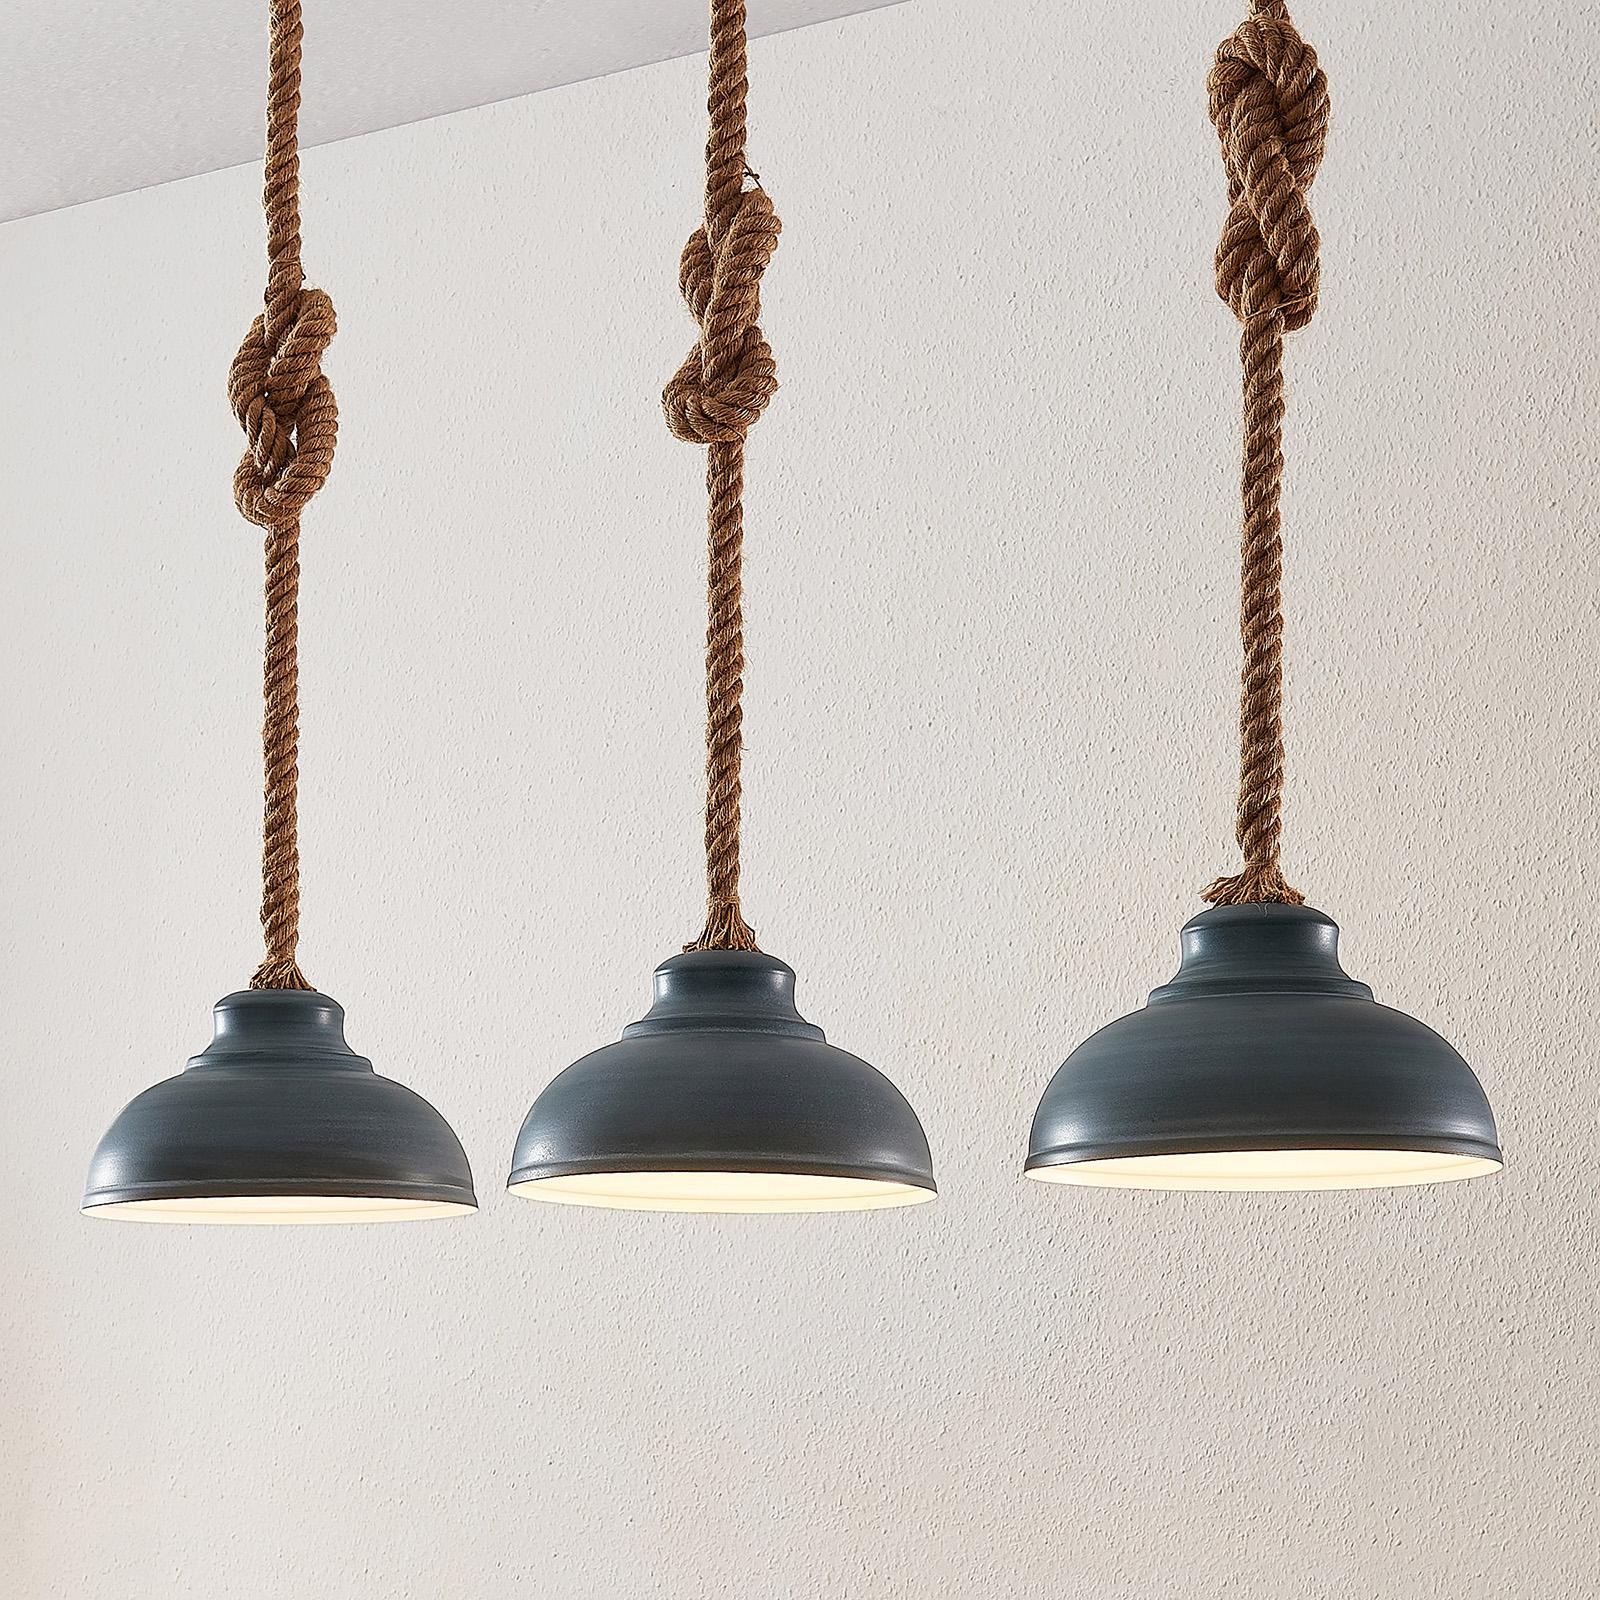 Lindby Chaby hengelampe i betongstil, 3 lyskilder